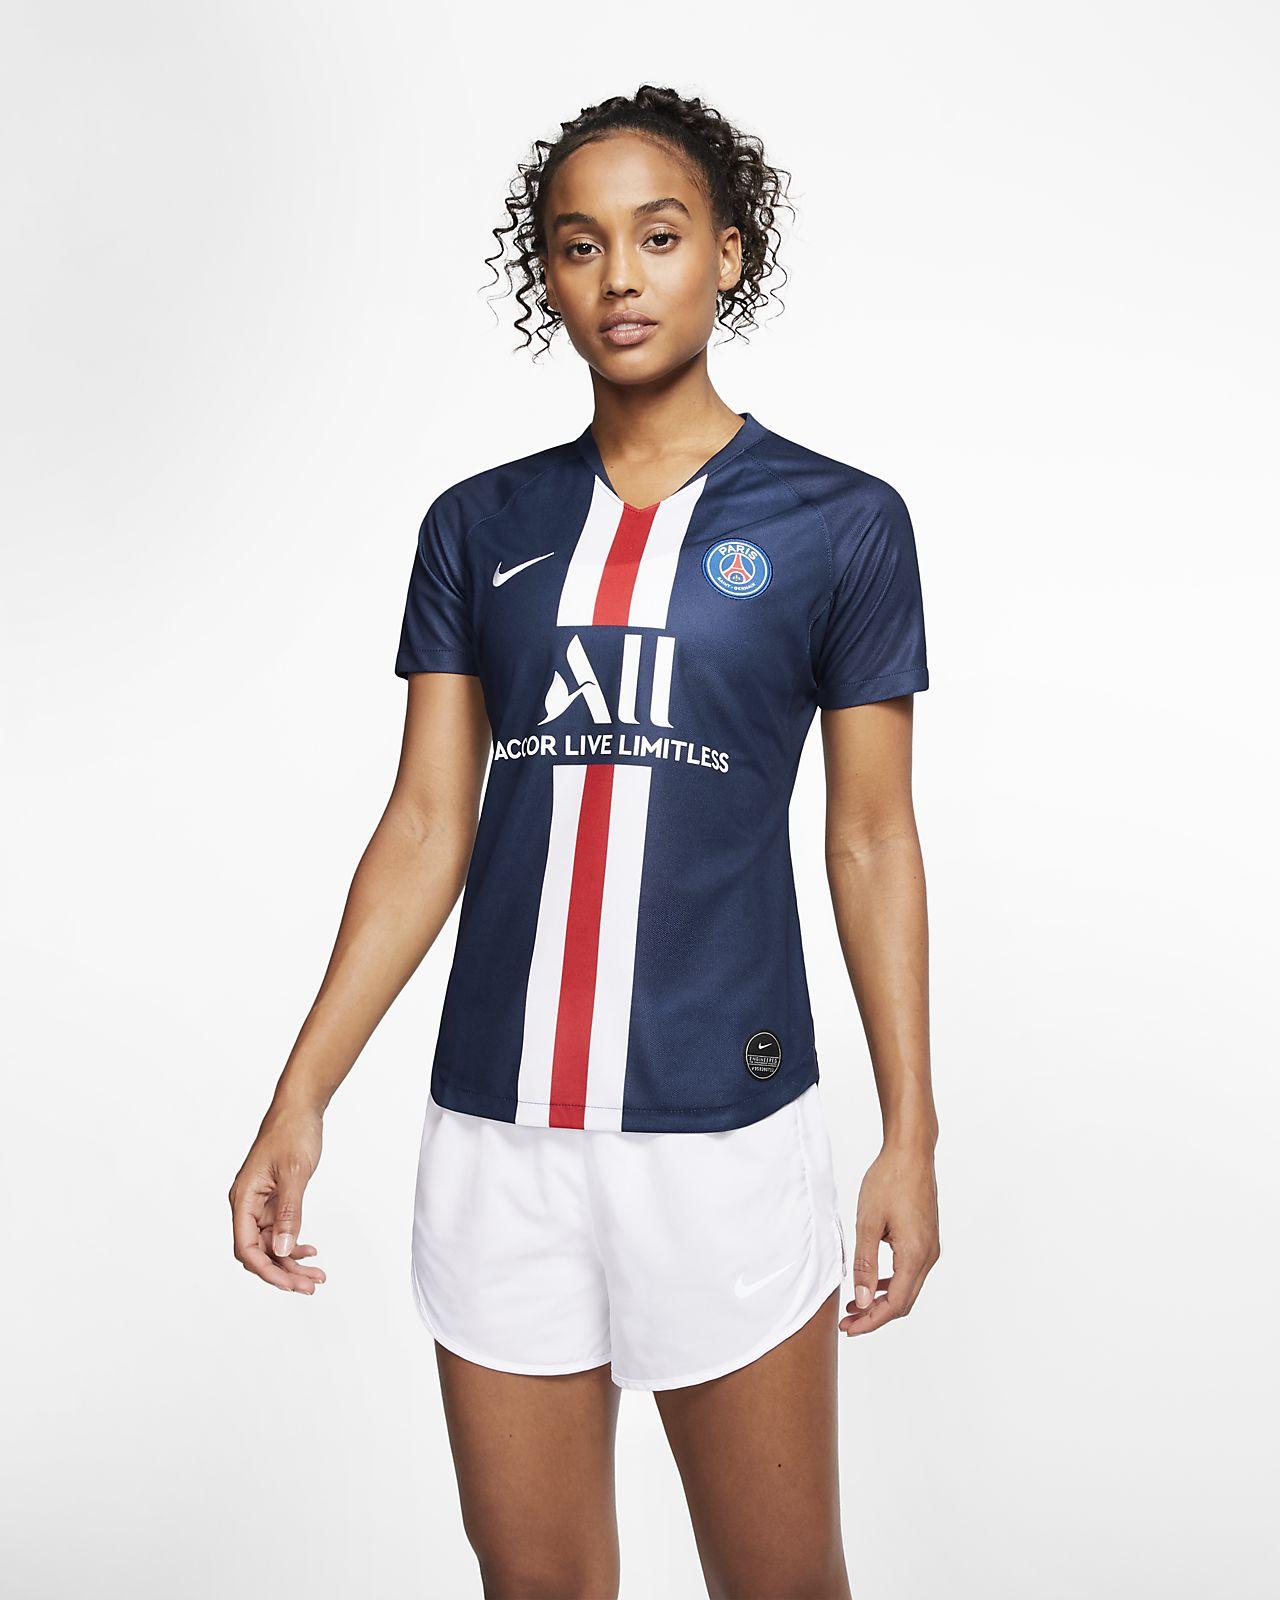 Camisola de futebol Paris Saint-Germain 2019/20 Stadium Home para mulher